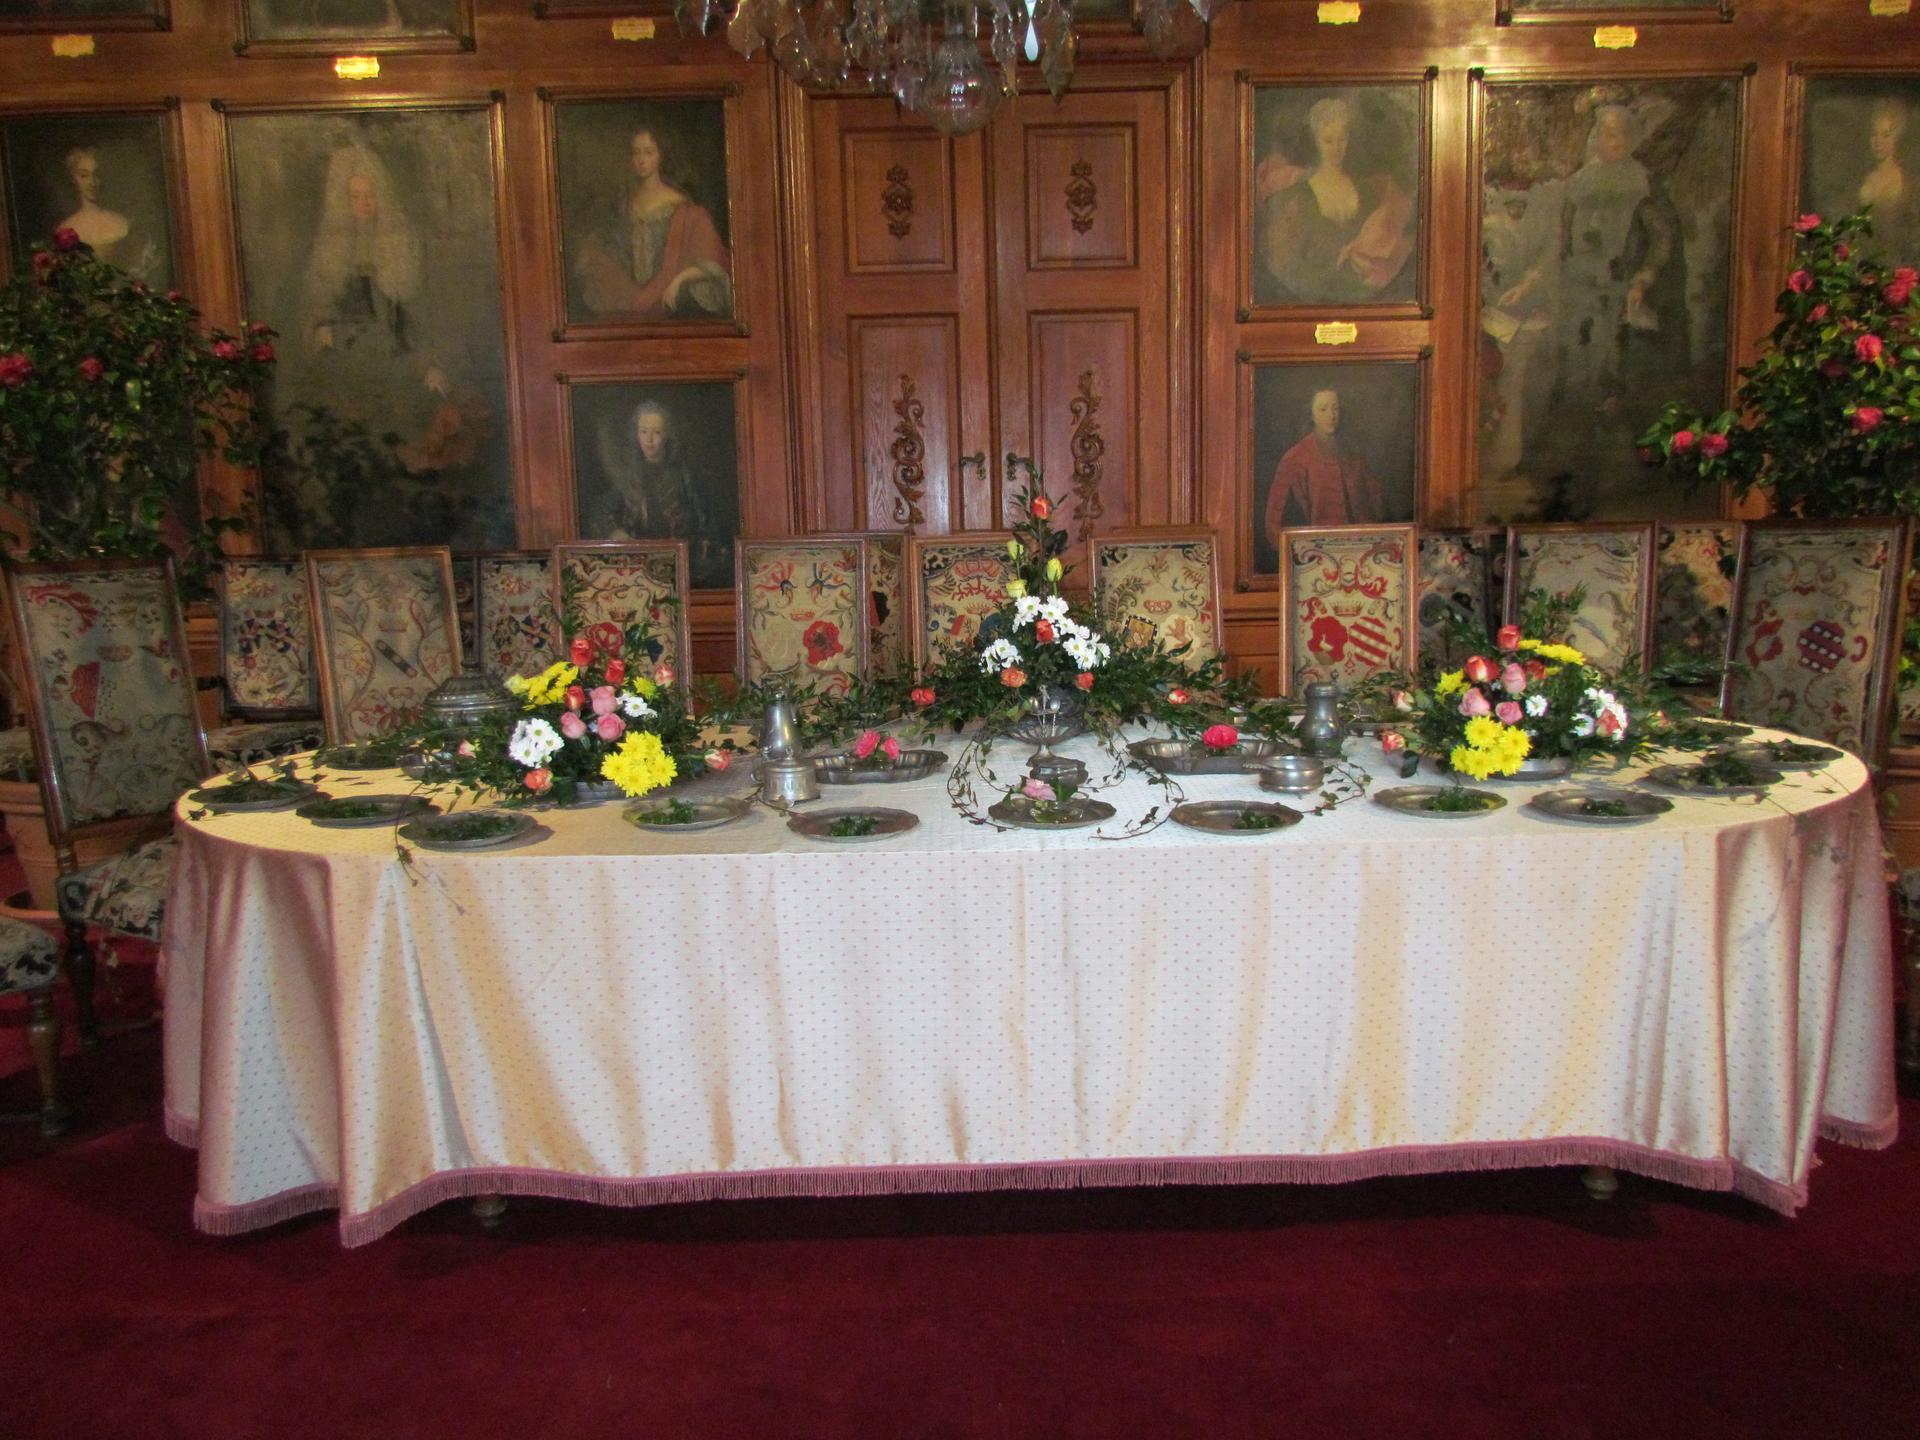 Kamelienausstellung Schloss Rajec2 Nationalinstitut fur Denkmalpflege Tschechische Republik